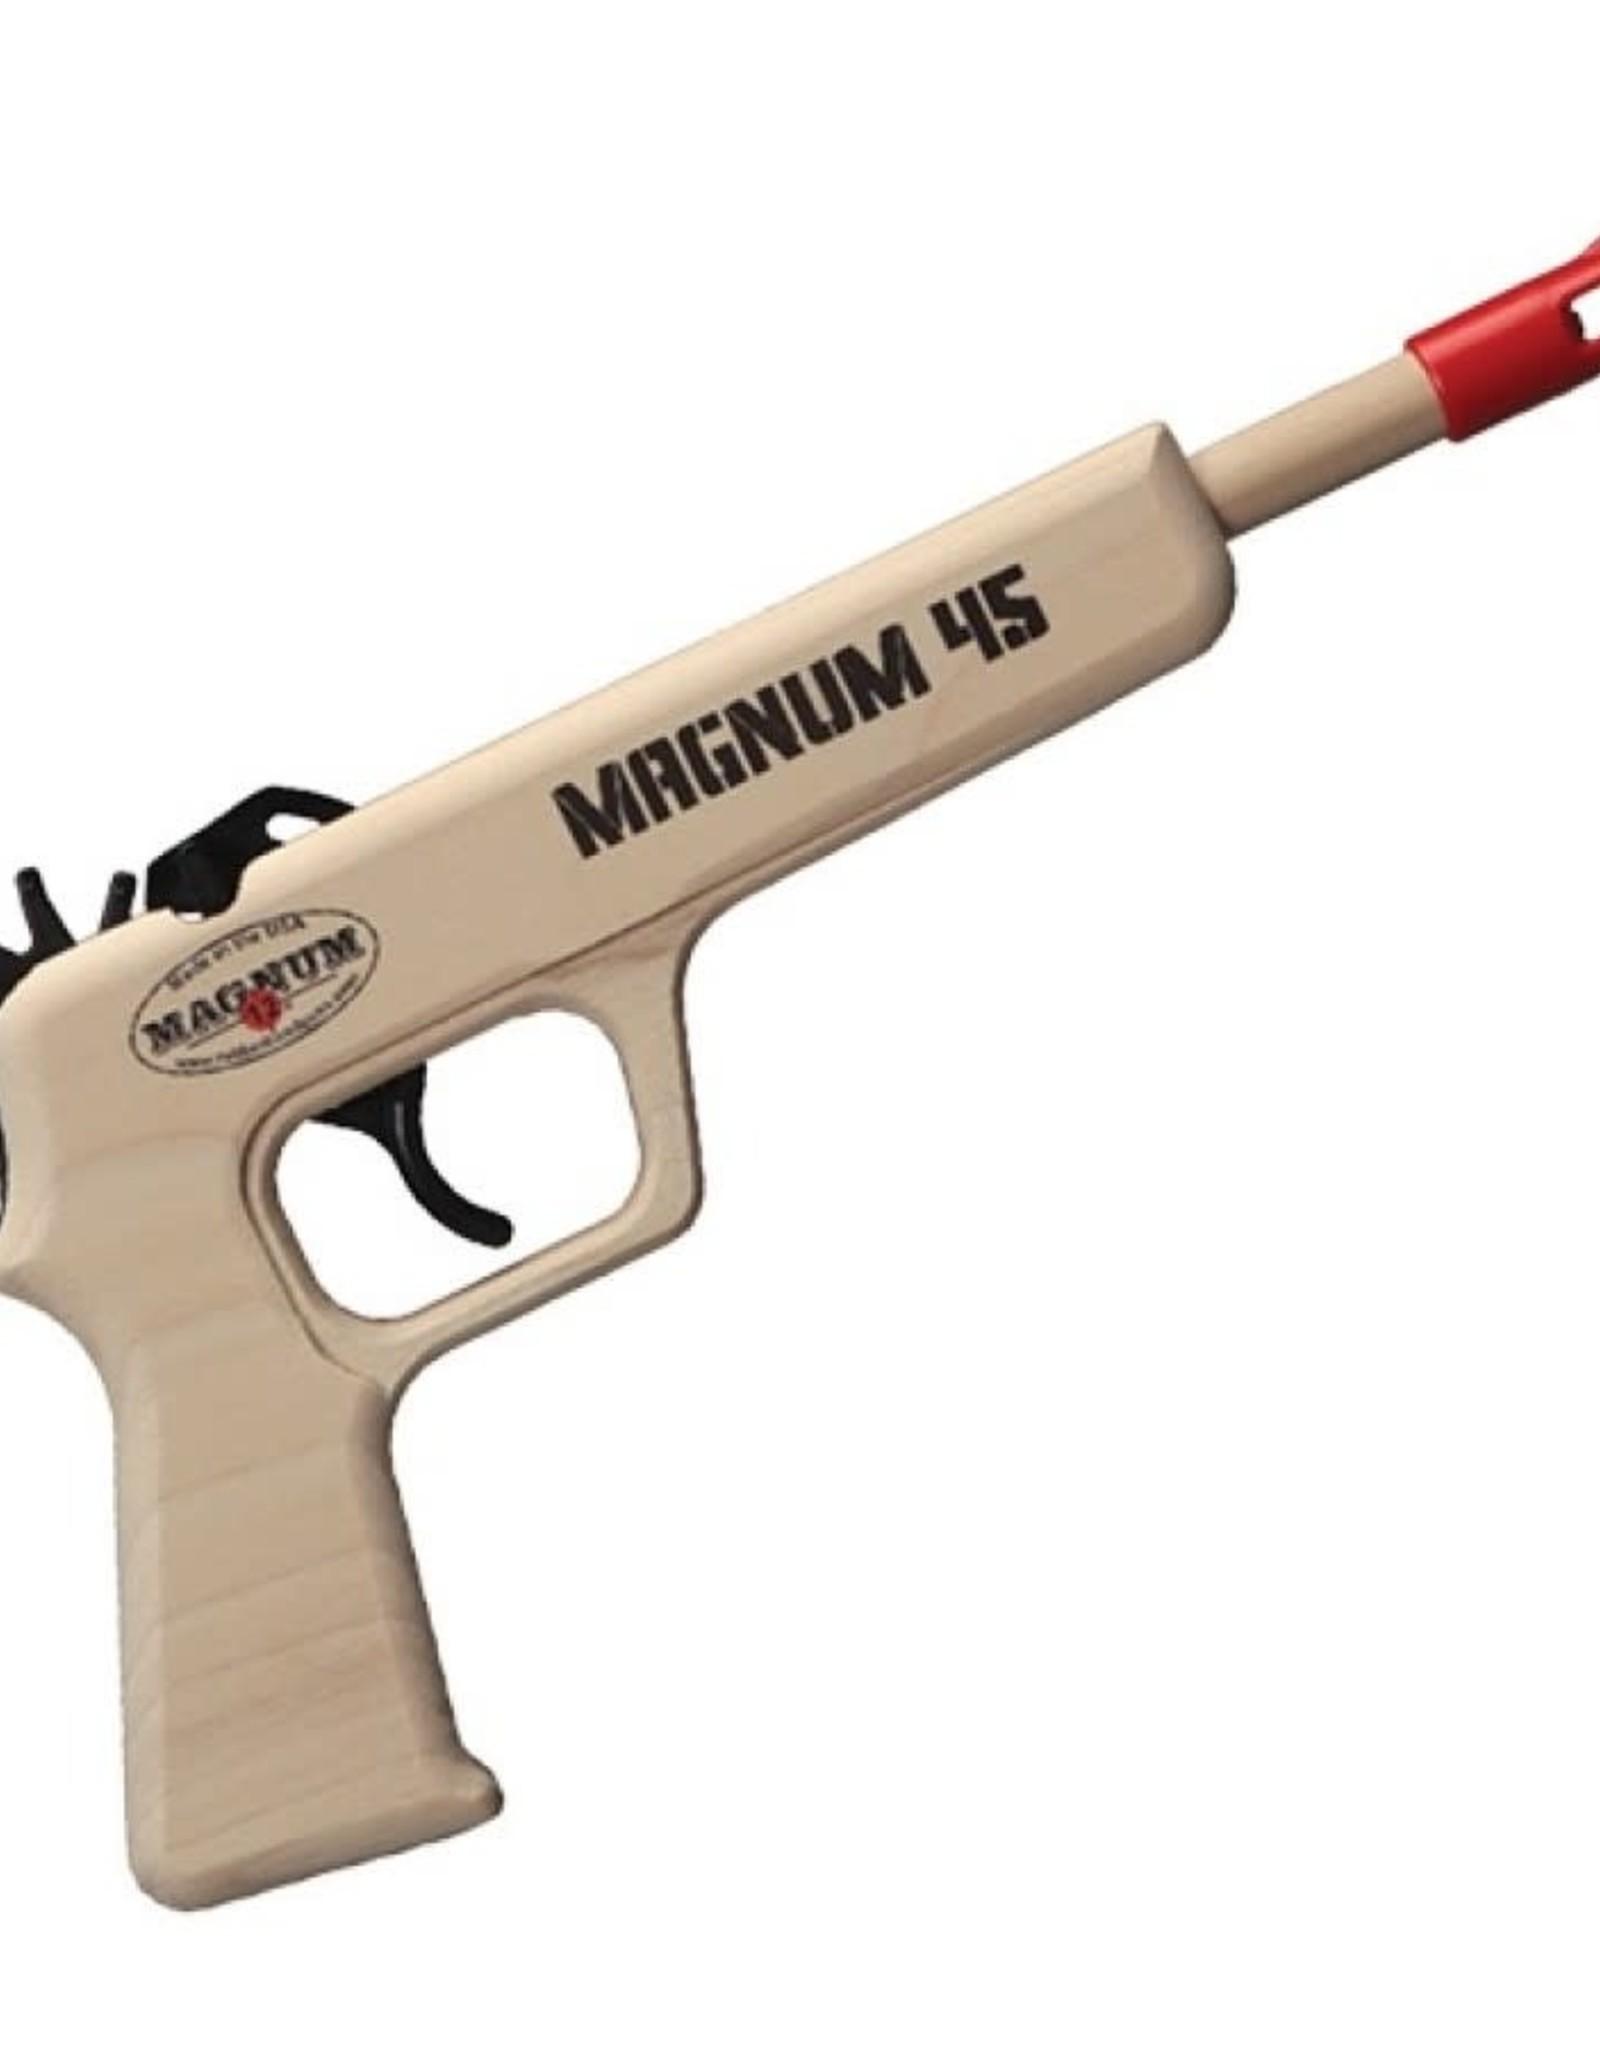 Magnum 12 Rubber Band Pistol Magnum 45 (Red)